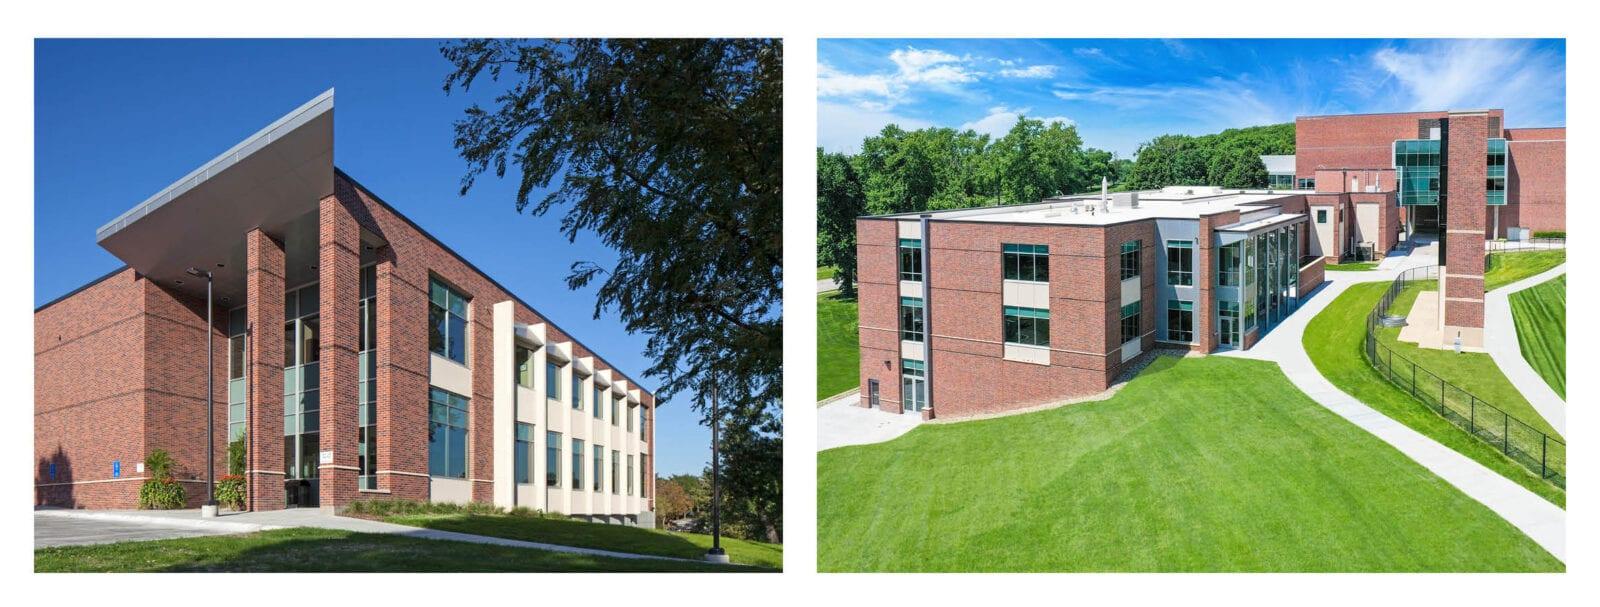 Schemmer_UNO Biomechanics Building and Addition_